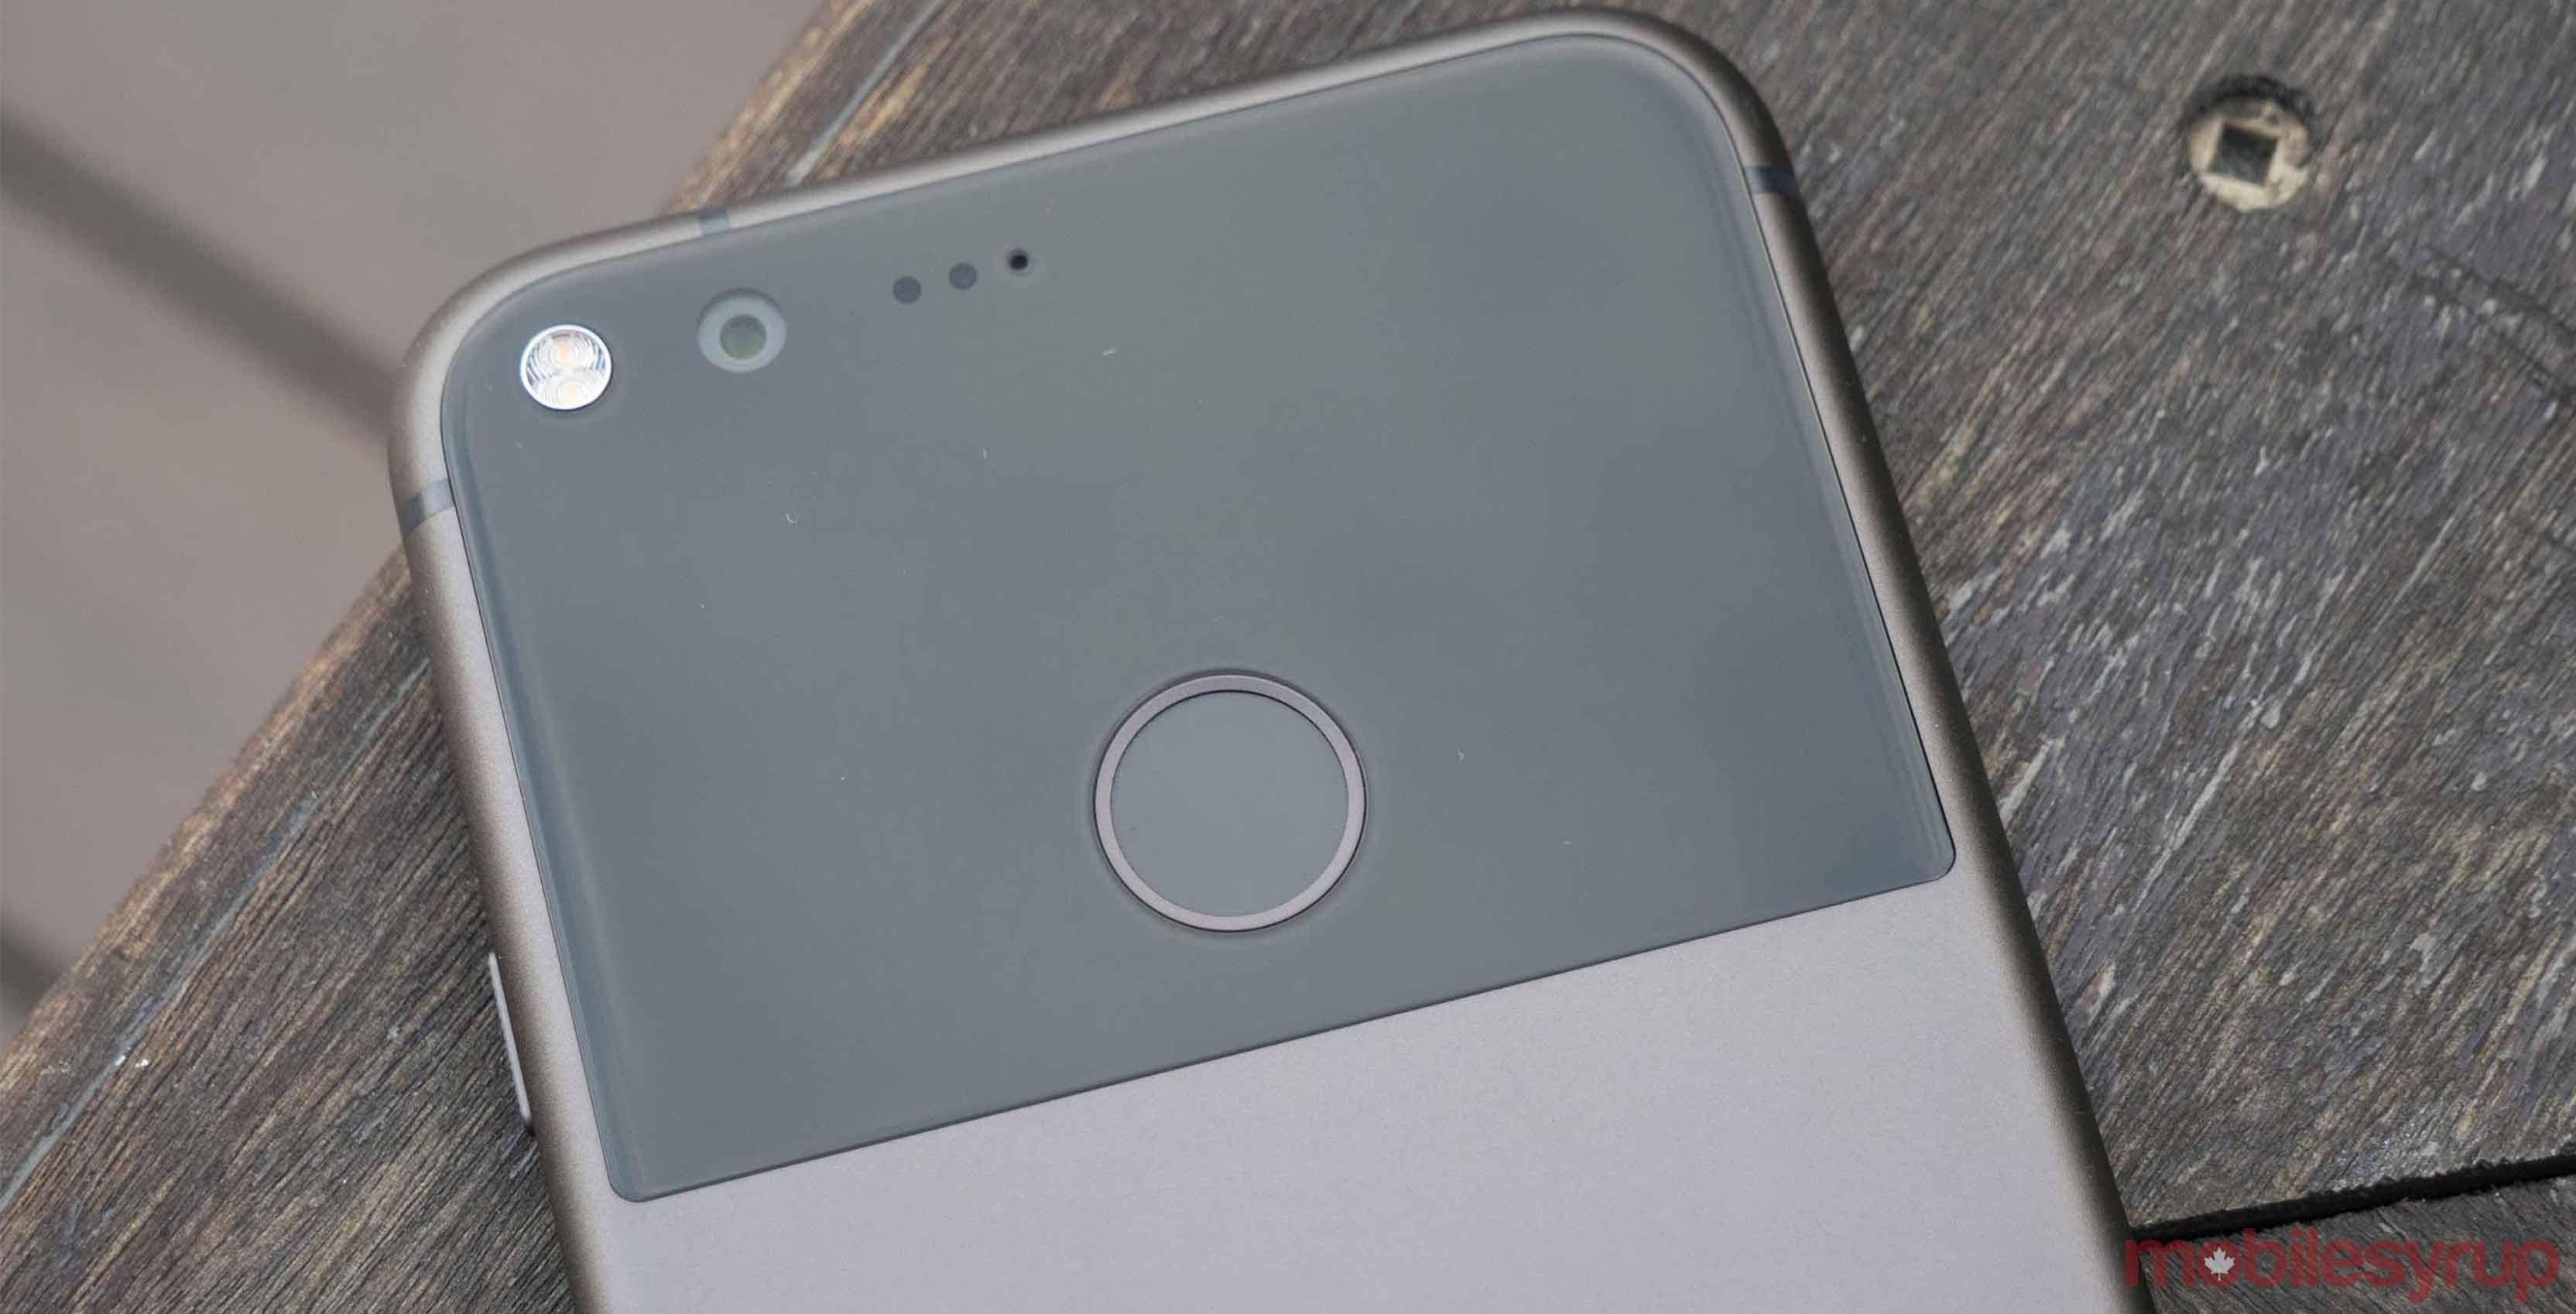 Google Pixel 2 leak promises low-end model and improved camera